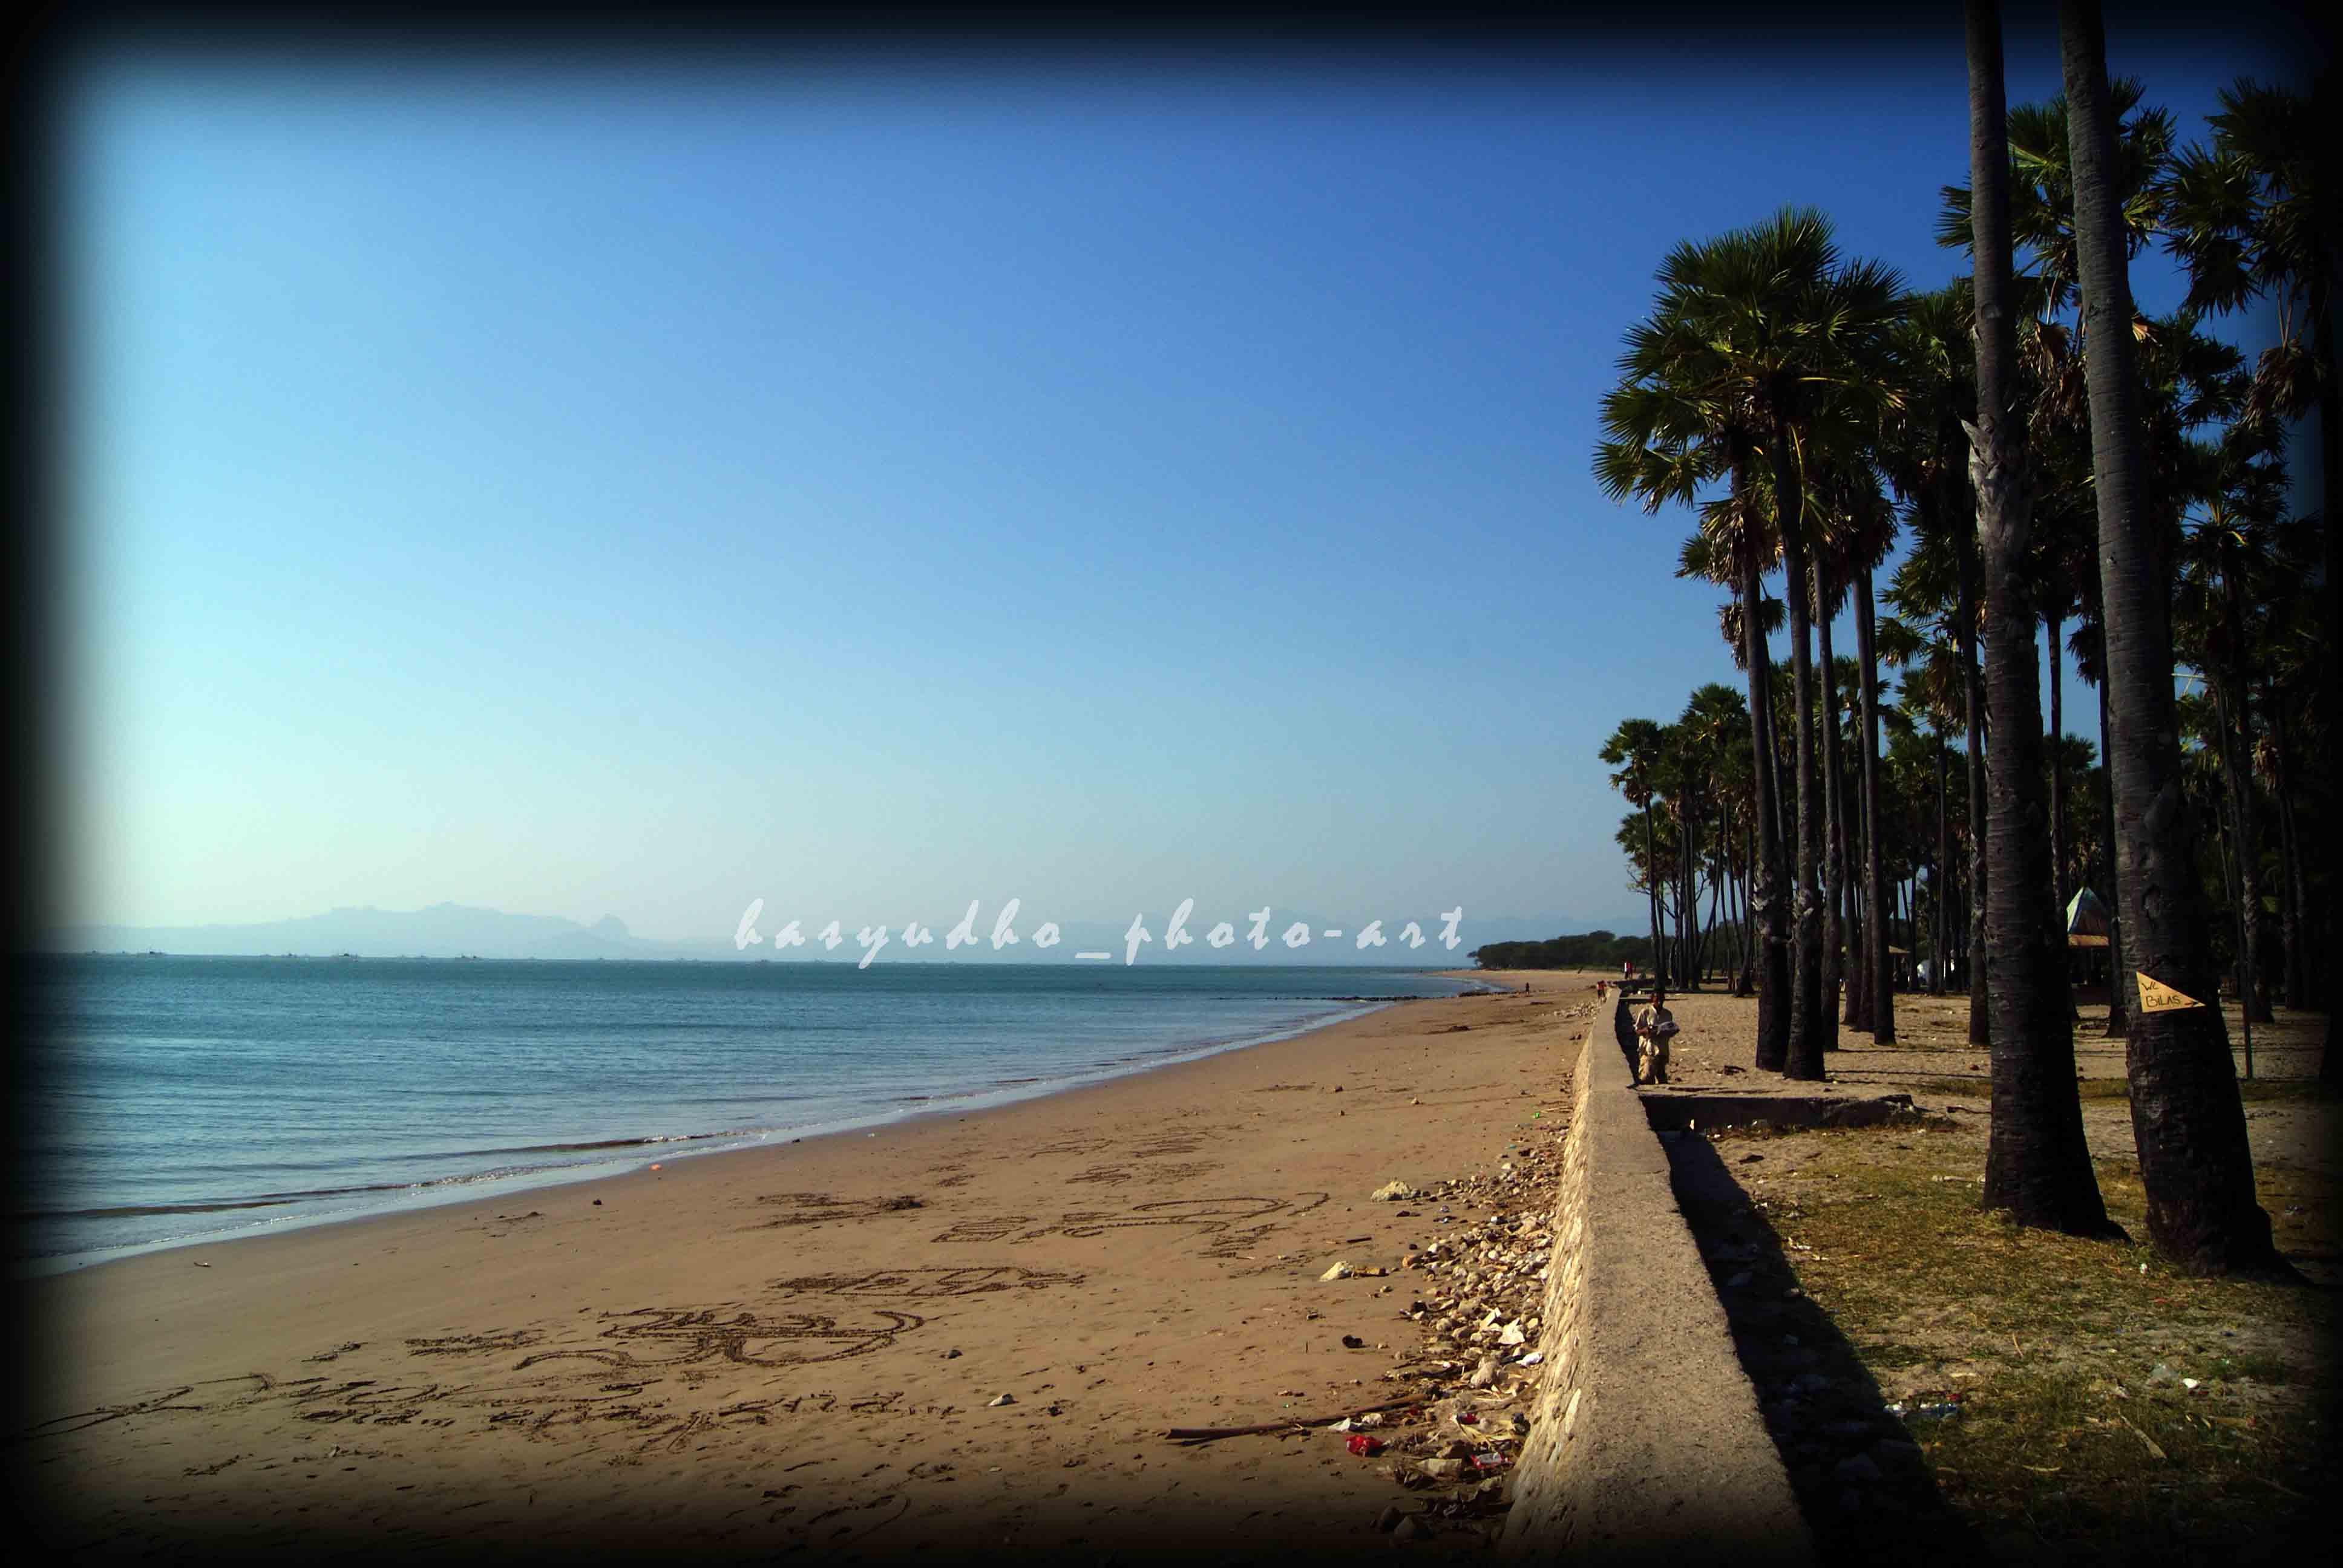 Pantai Lasiana Indah Timur Kota Kupang Hasyudho Kab